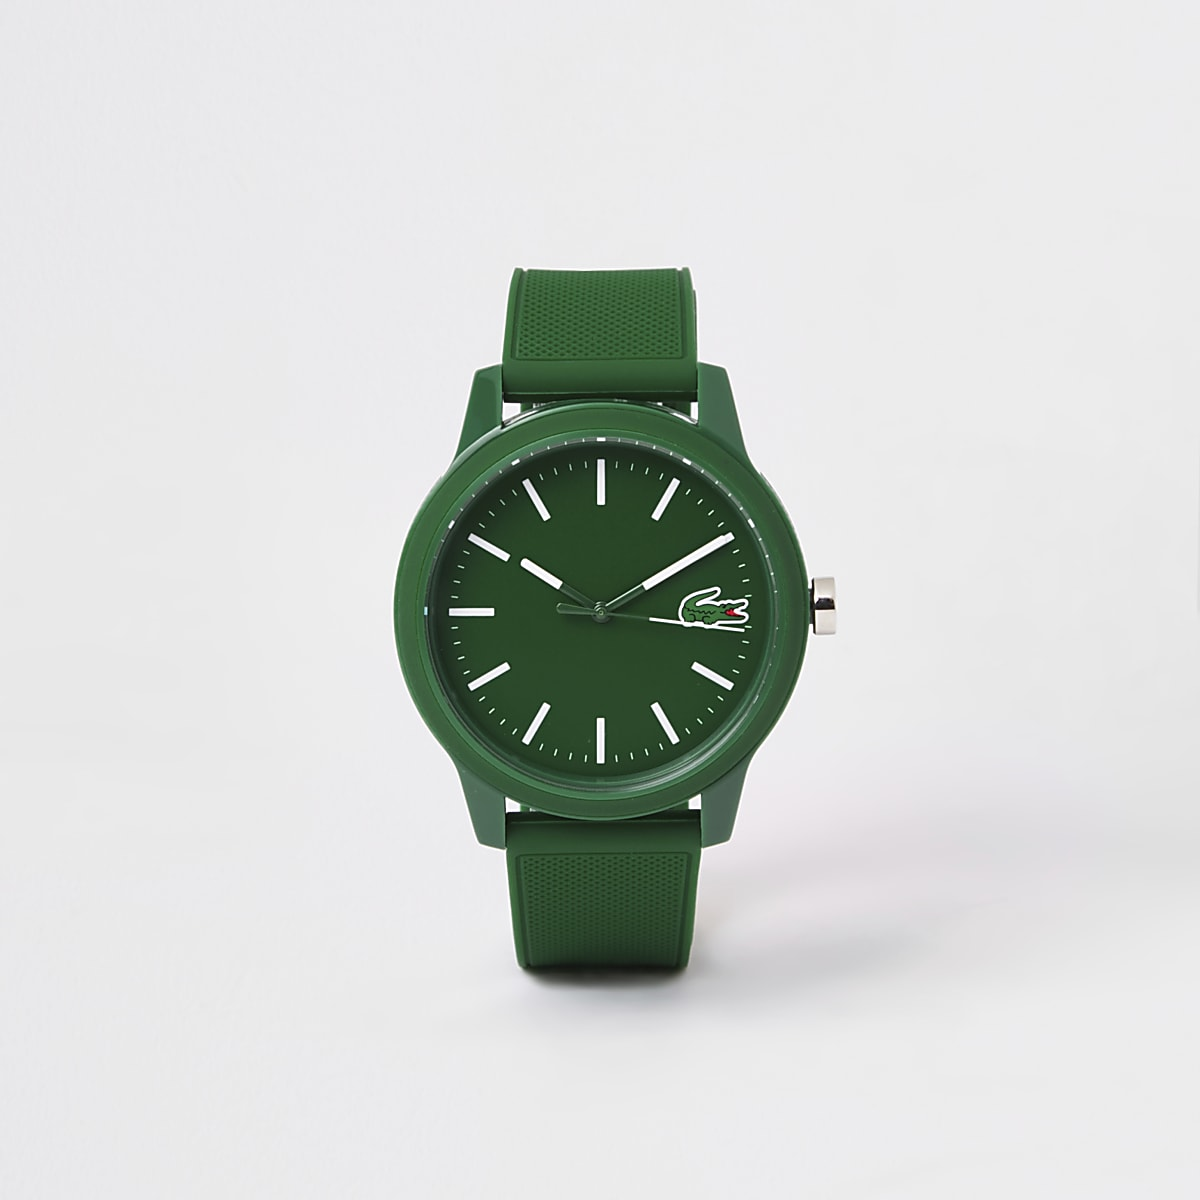 Lacoste – Grüne Silikon-Armbanduhr 12.12